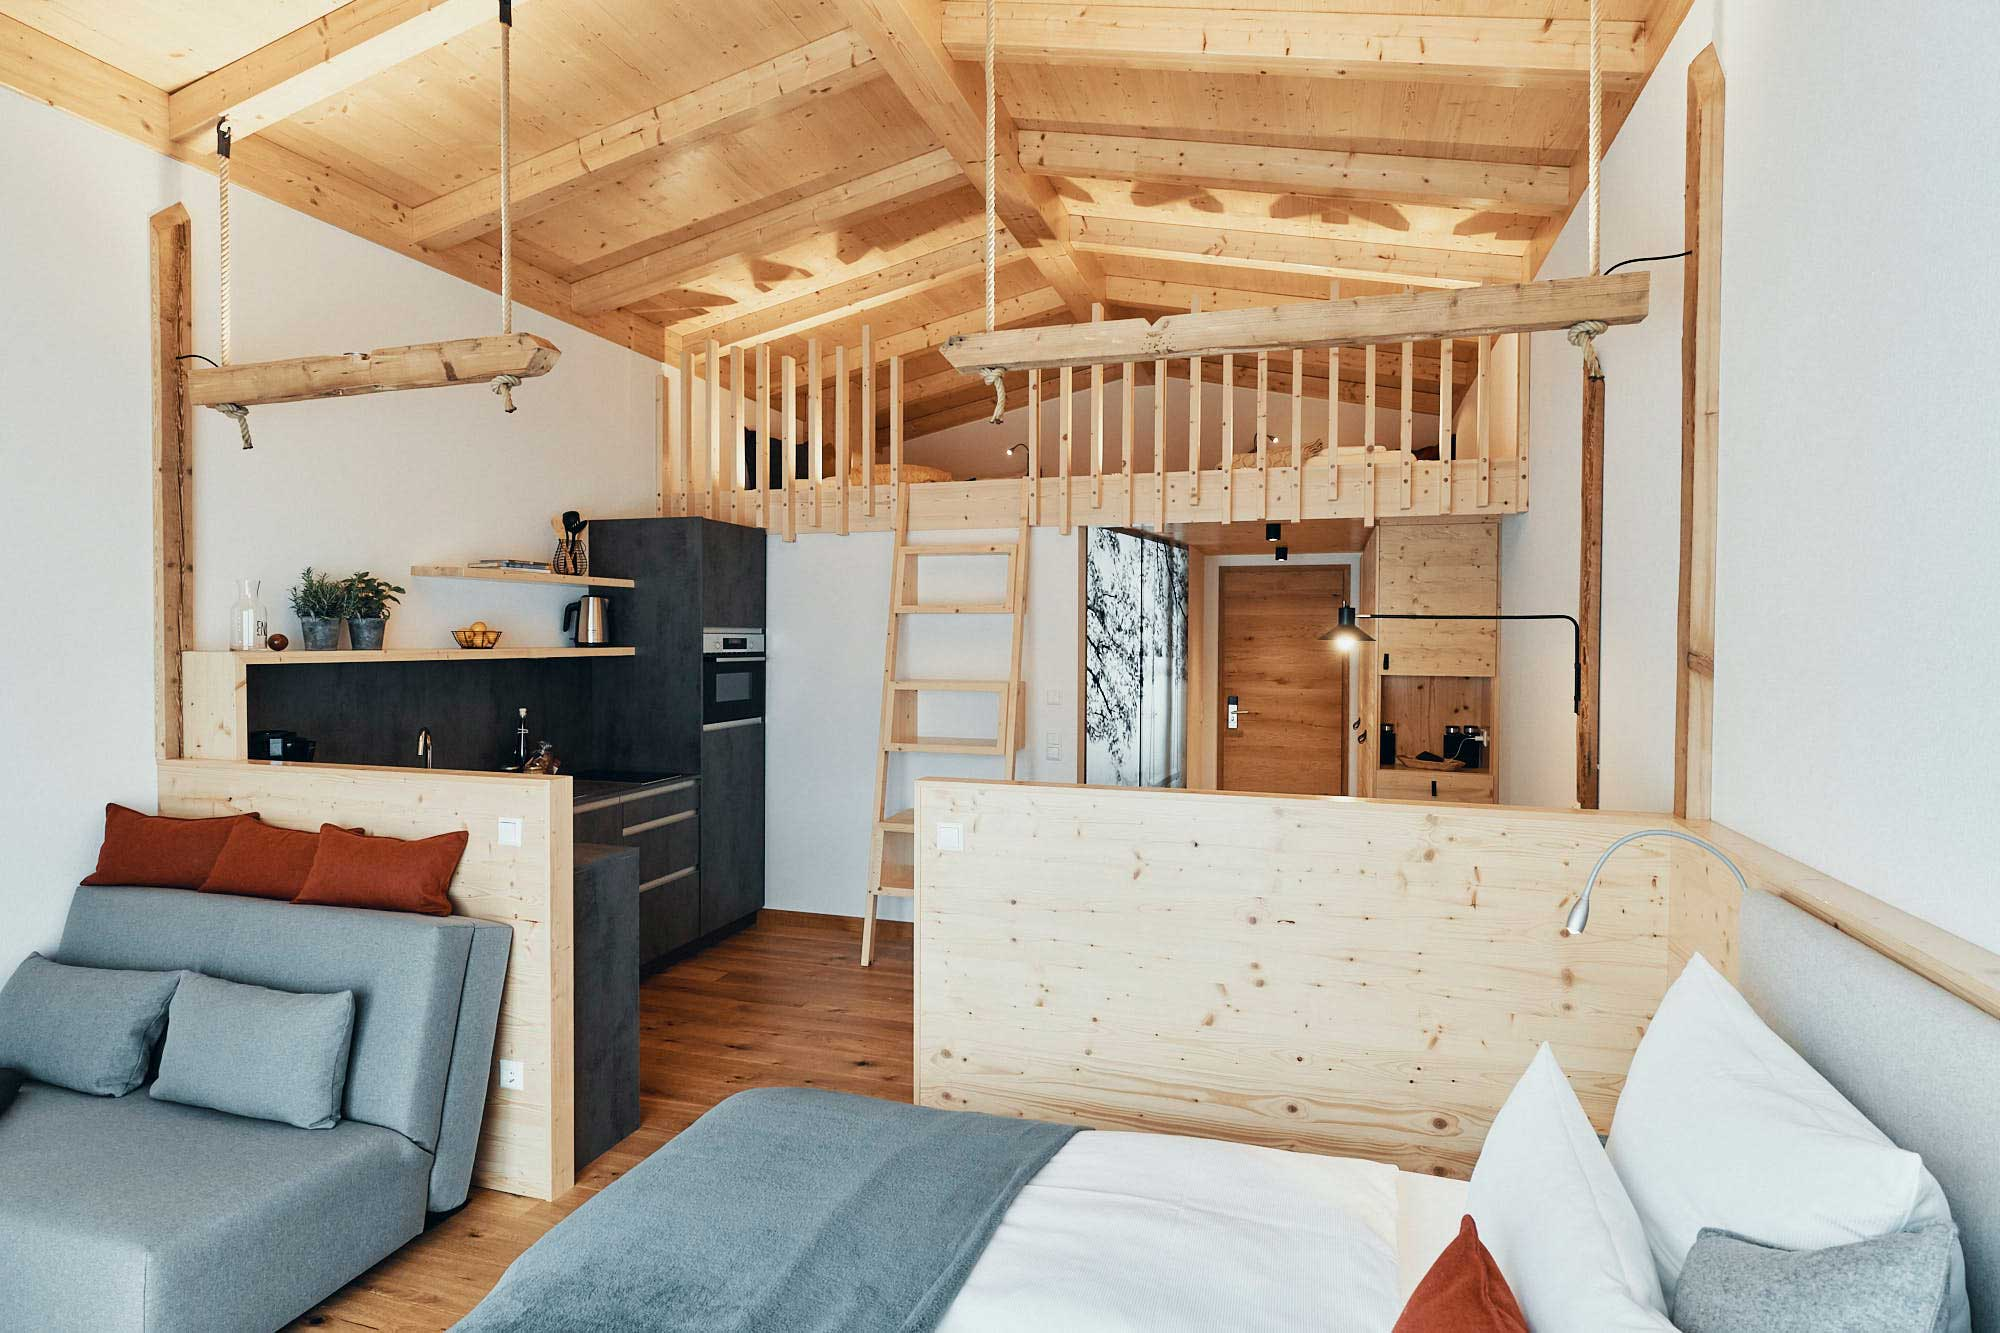 ECHTZEIT Ferien Apartment - Lieblingsplatz - Wohlfühl-Zimmer